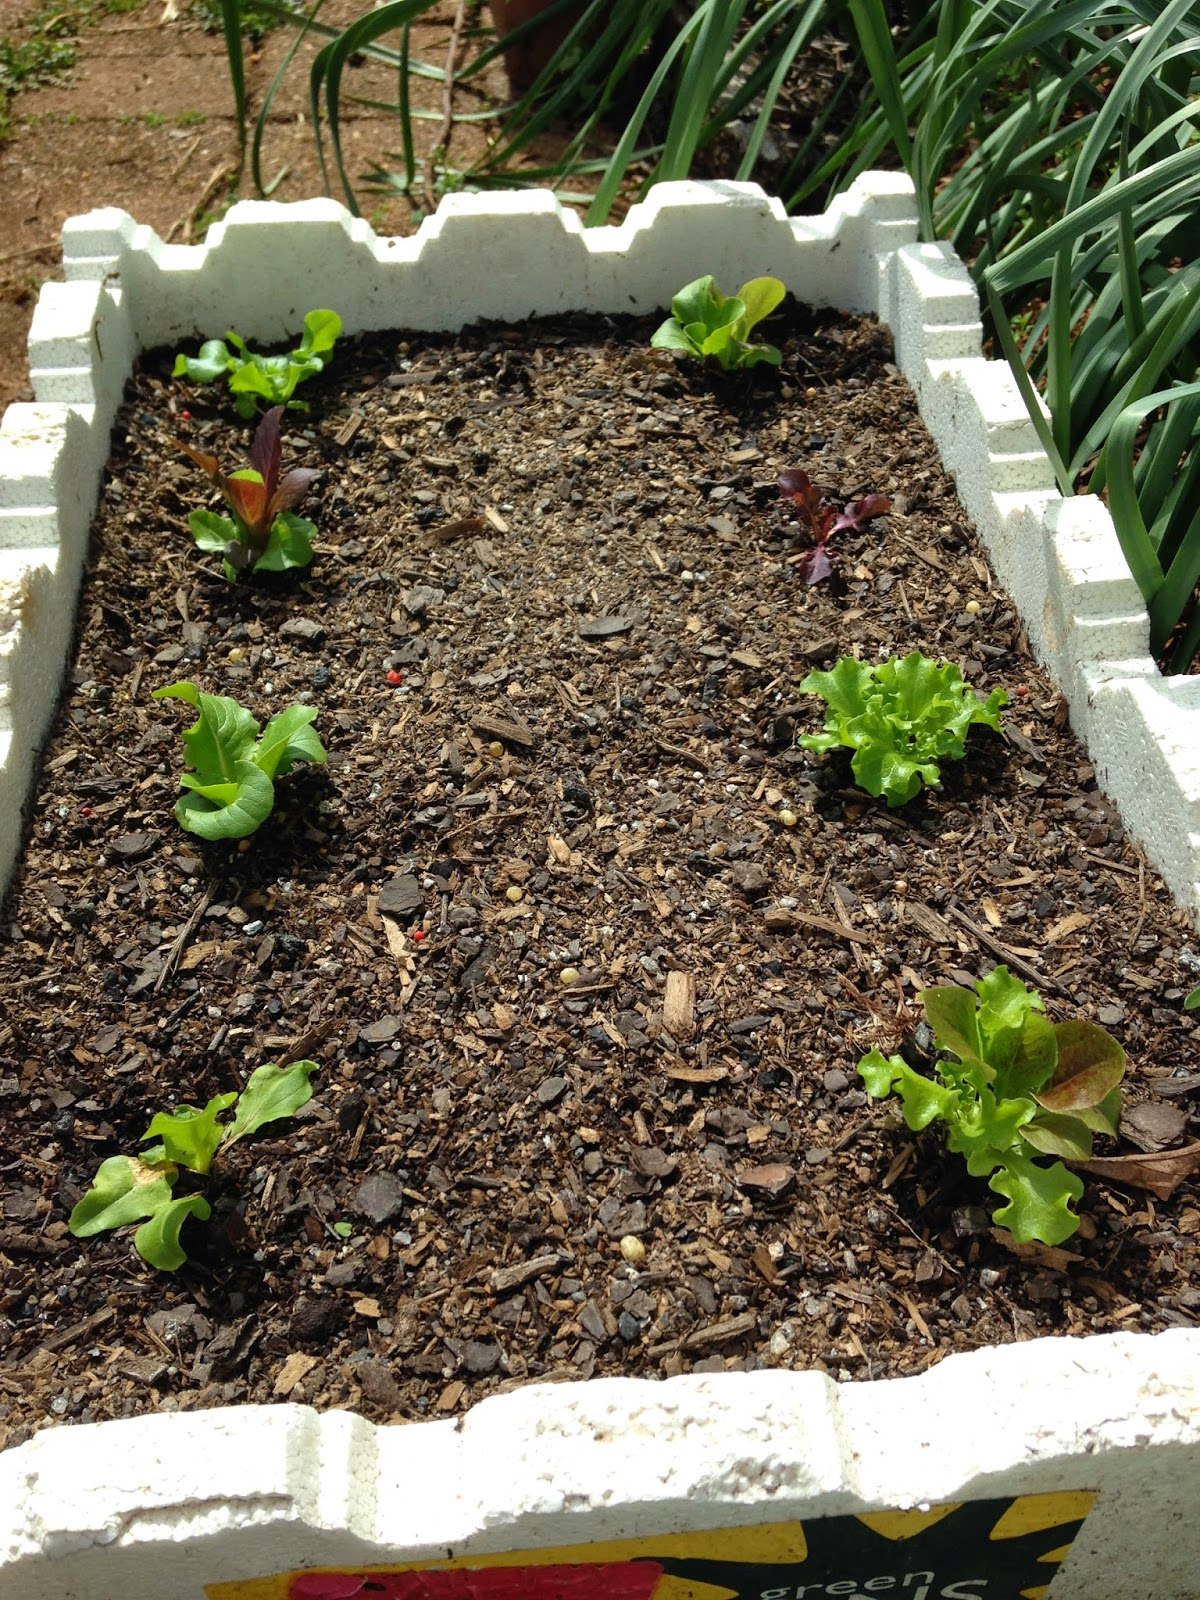 My Veggie Garden: Planting Lettuce in a Styrofoam Box/Pot/Container.